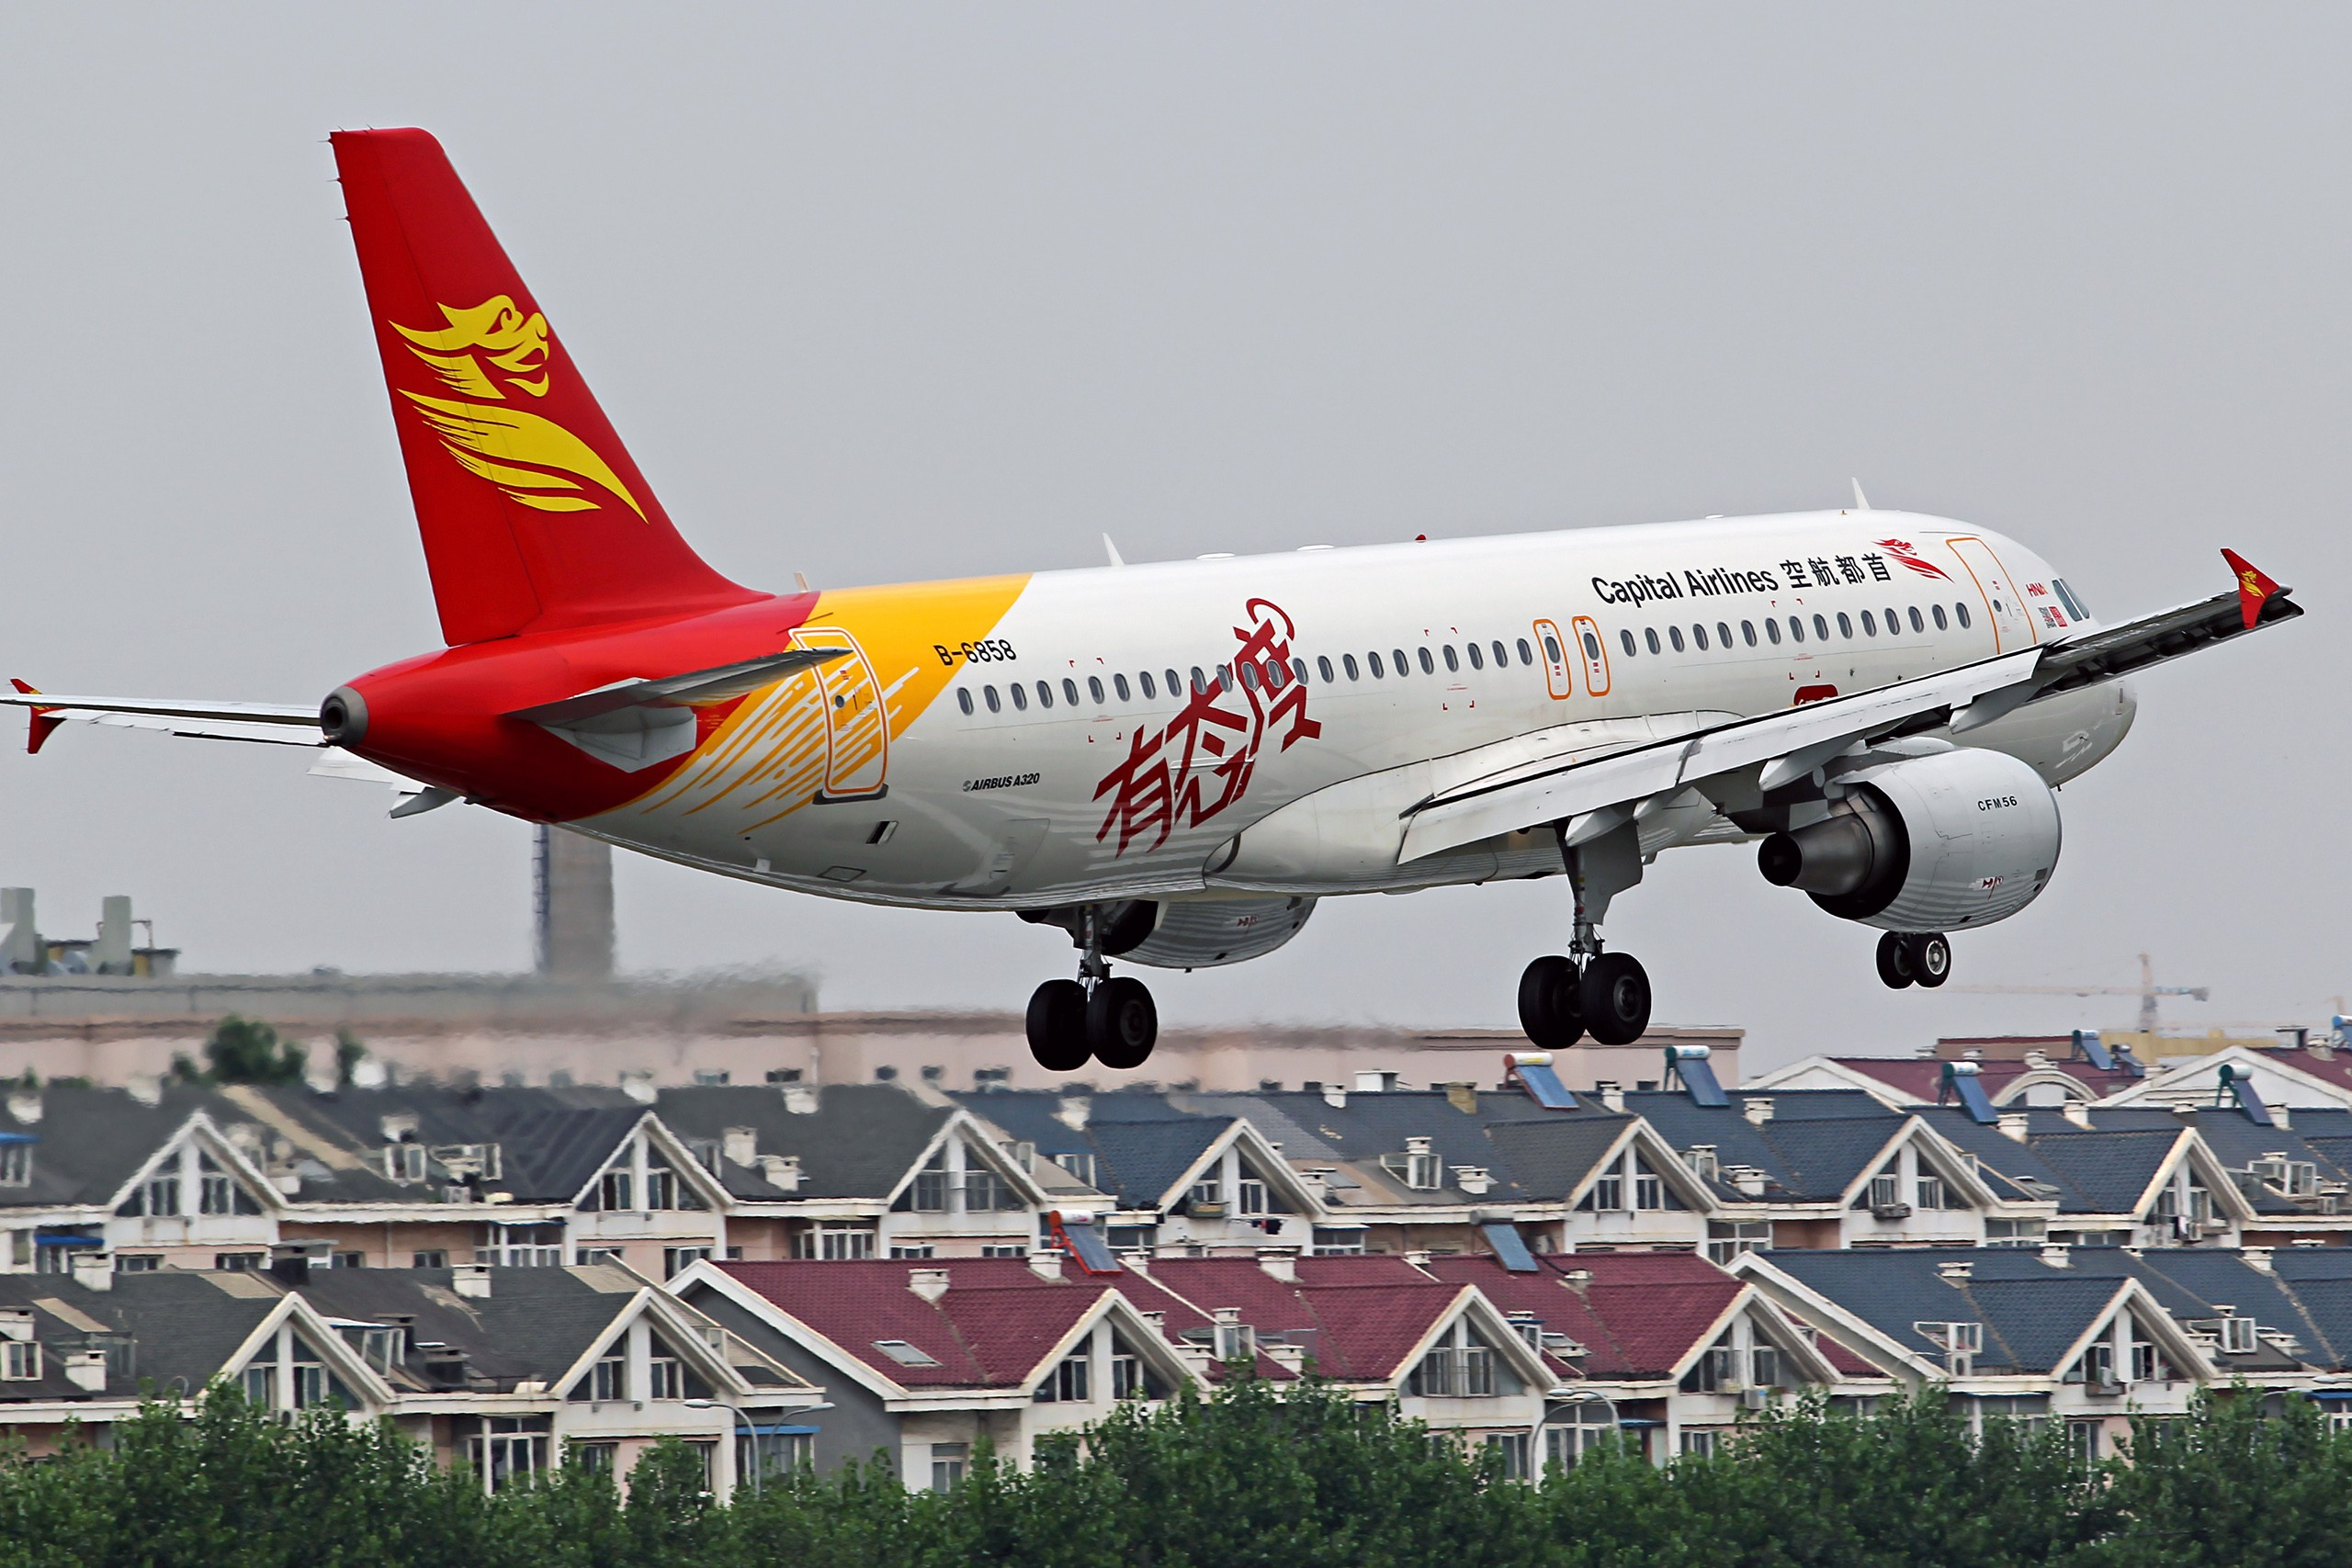 Re:[原创][DLC]...窄体机...2560x1707}Pix AIRBUS A320-200 B-6858 中国大连周水子国际机场